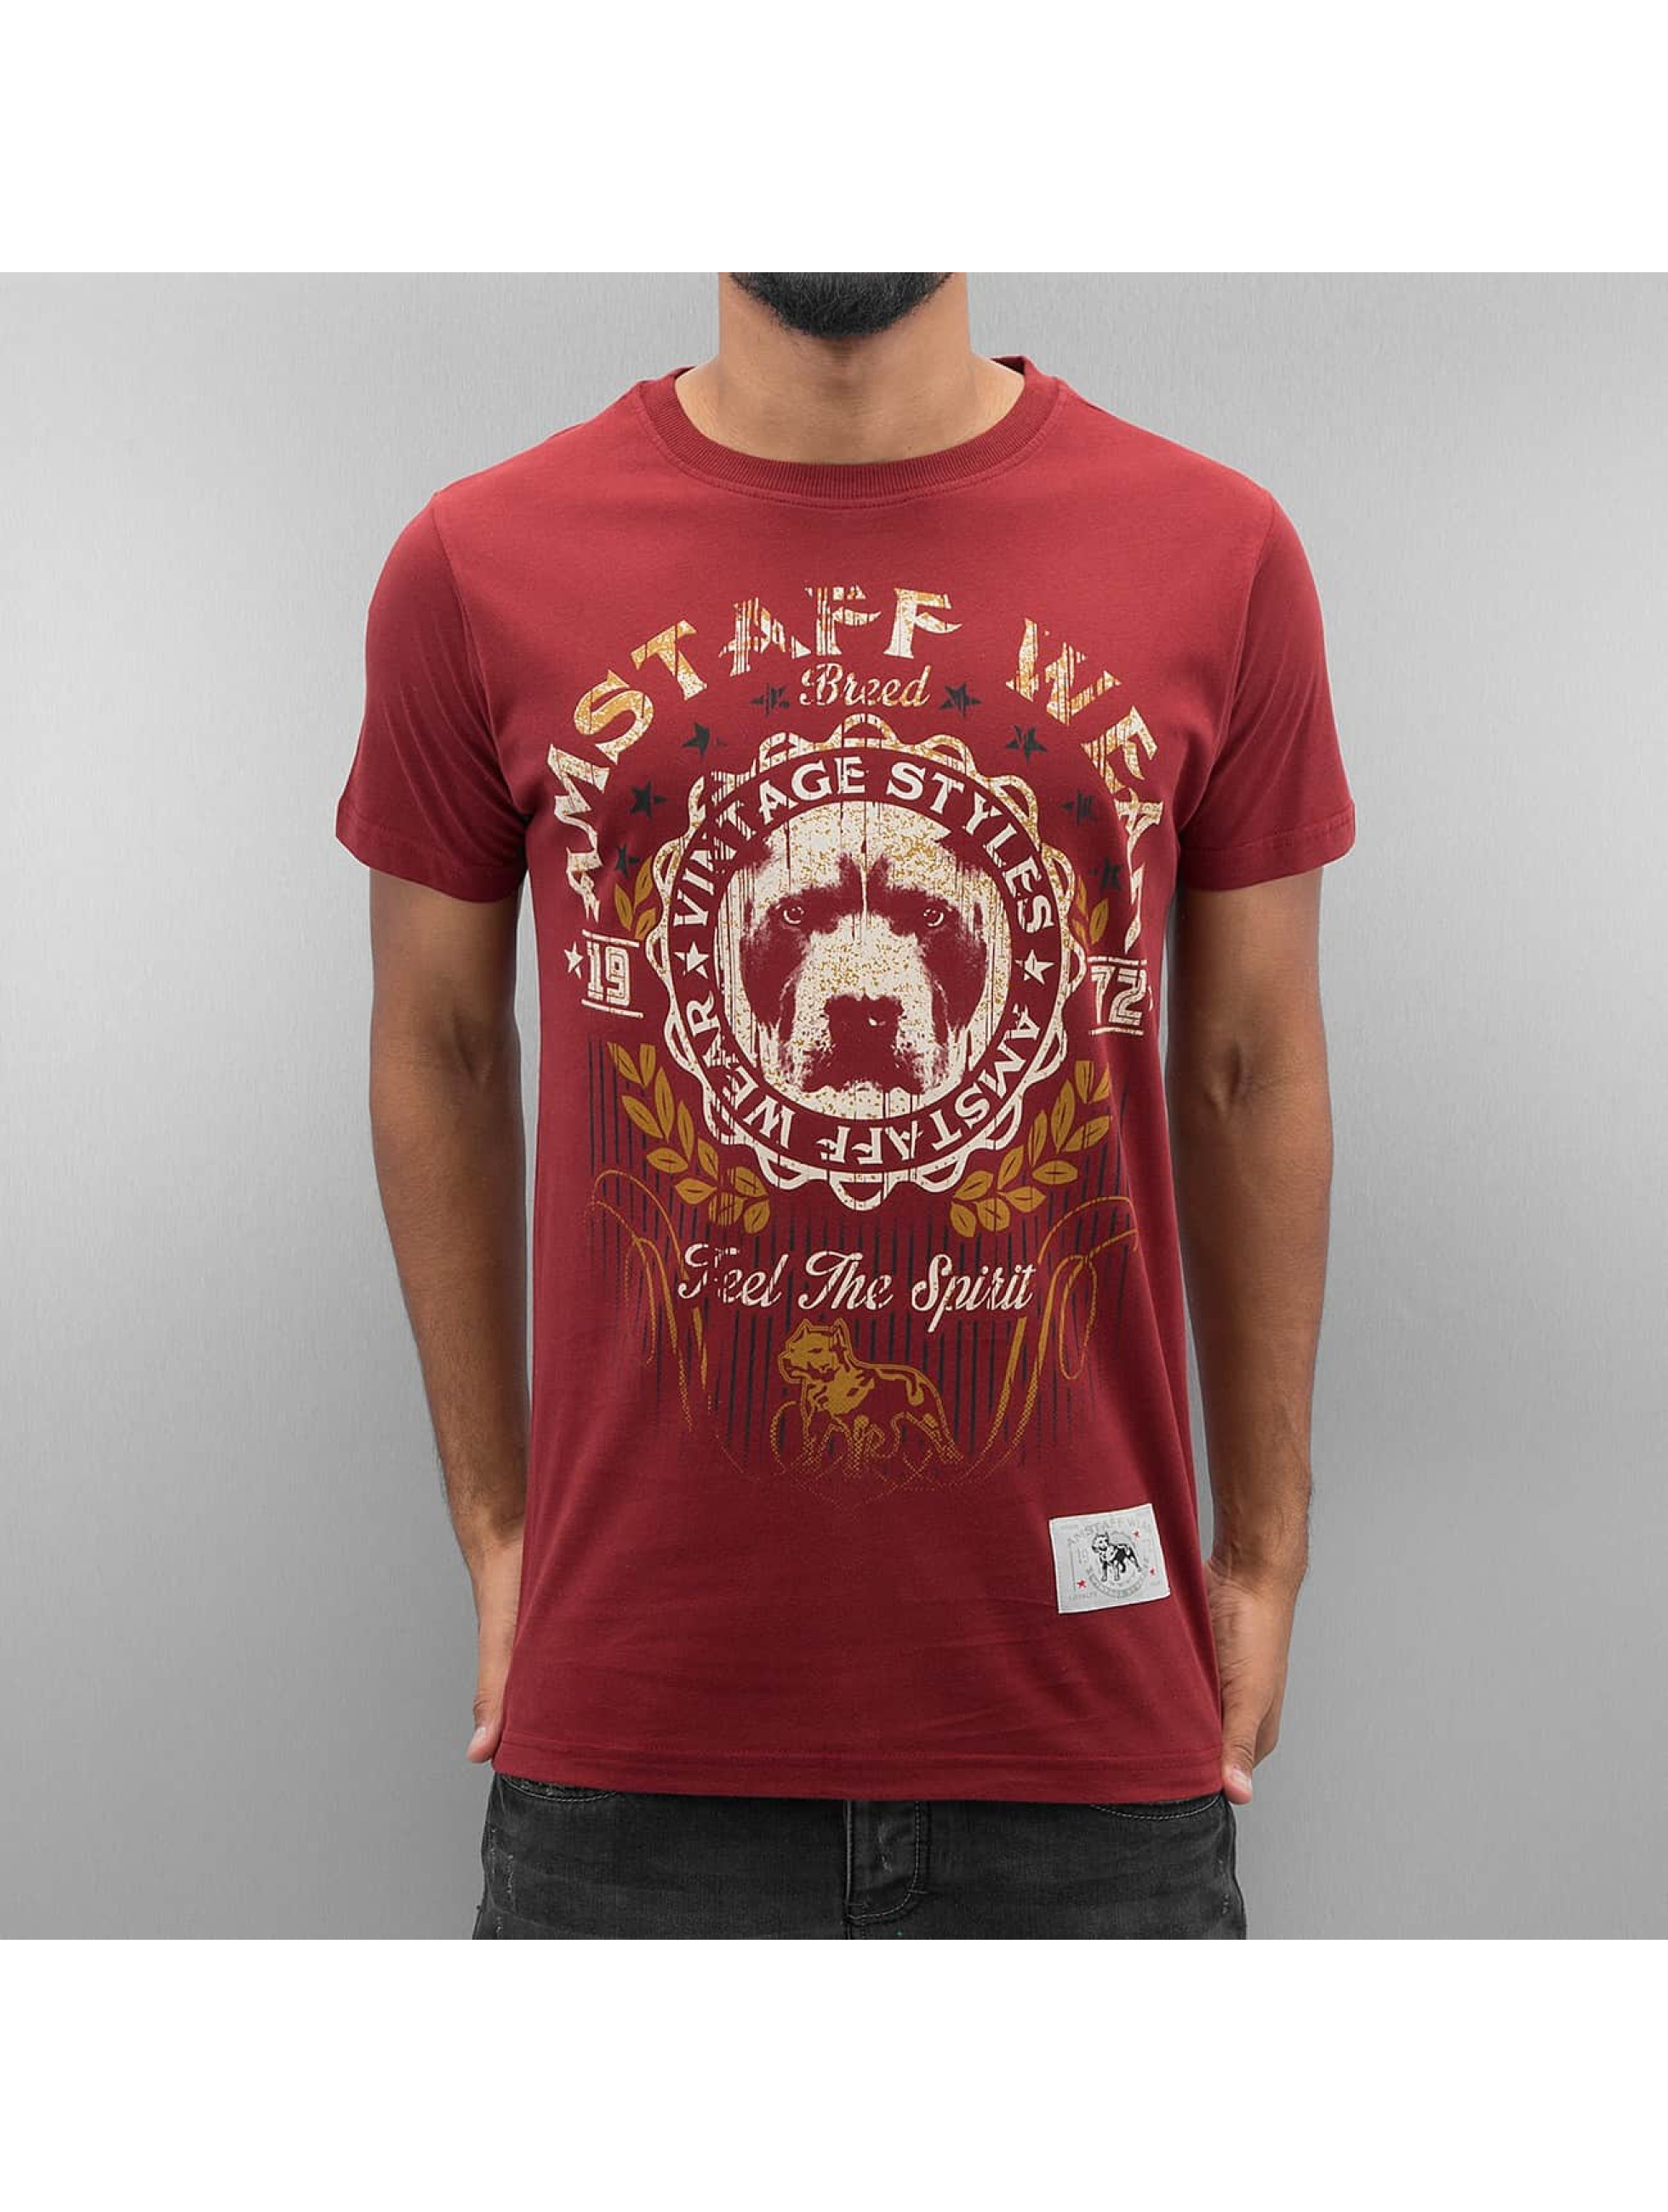 Groß Döbbern Angebote Amstaff Männer T-Shirt Malex in rot